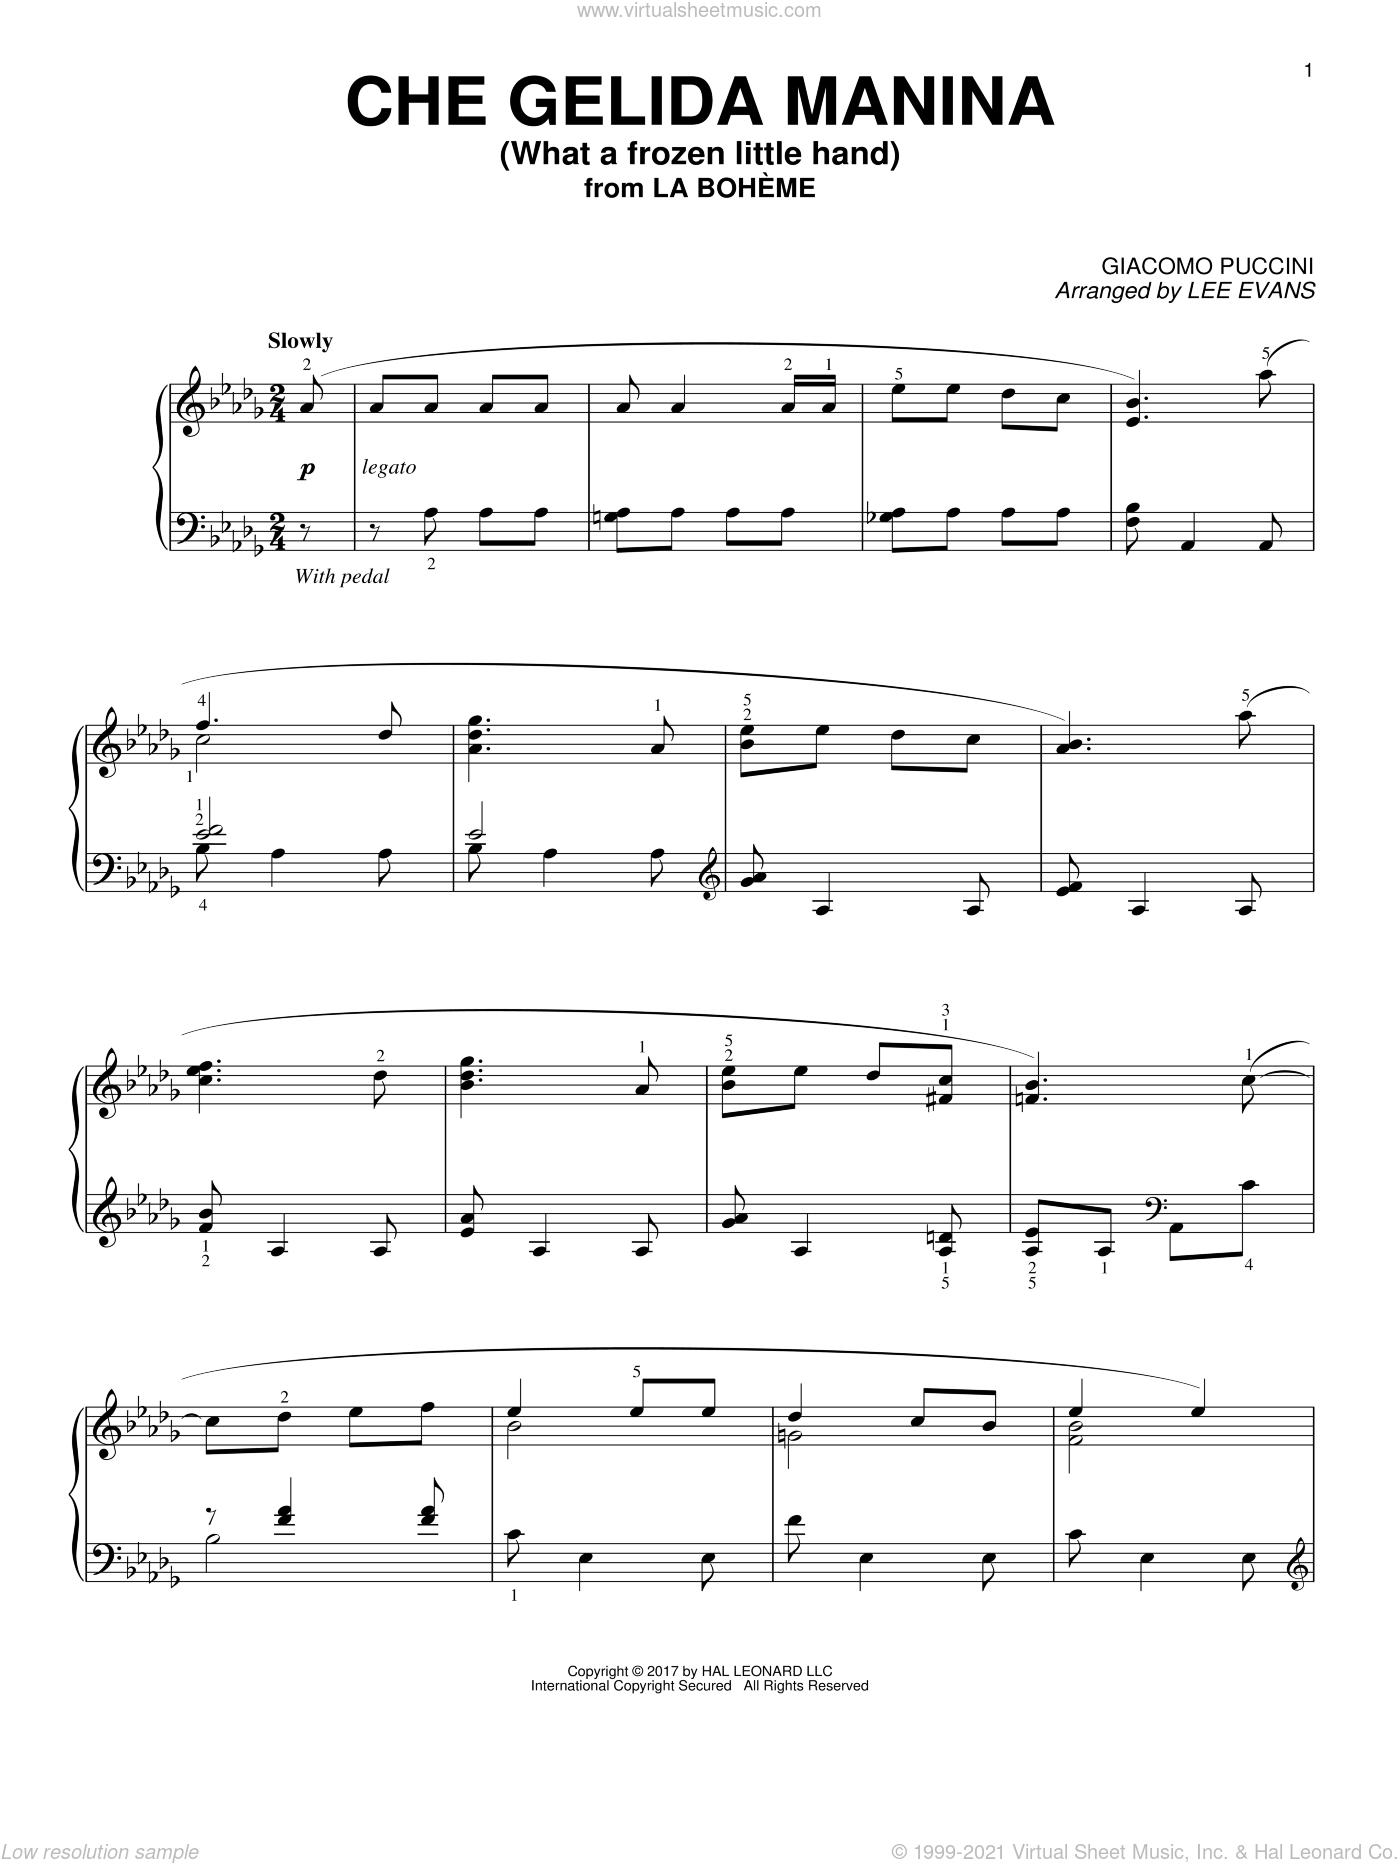 Che gelida manina from La Boheme sheet music for piano solo by Giacomo Puccini and Lee Evans, classical score, intermediate skill level